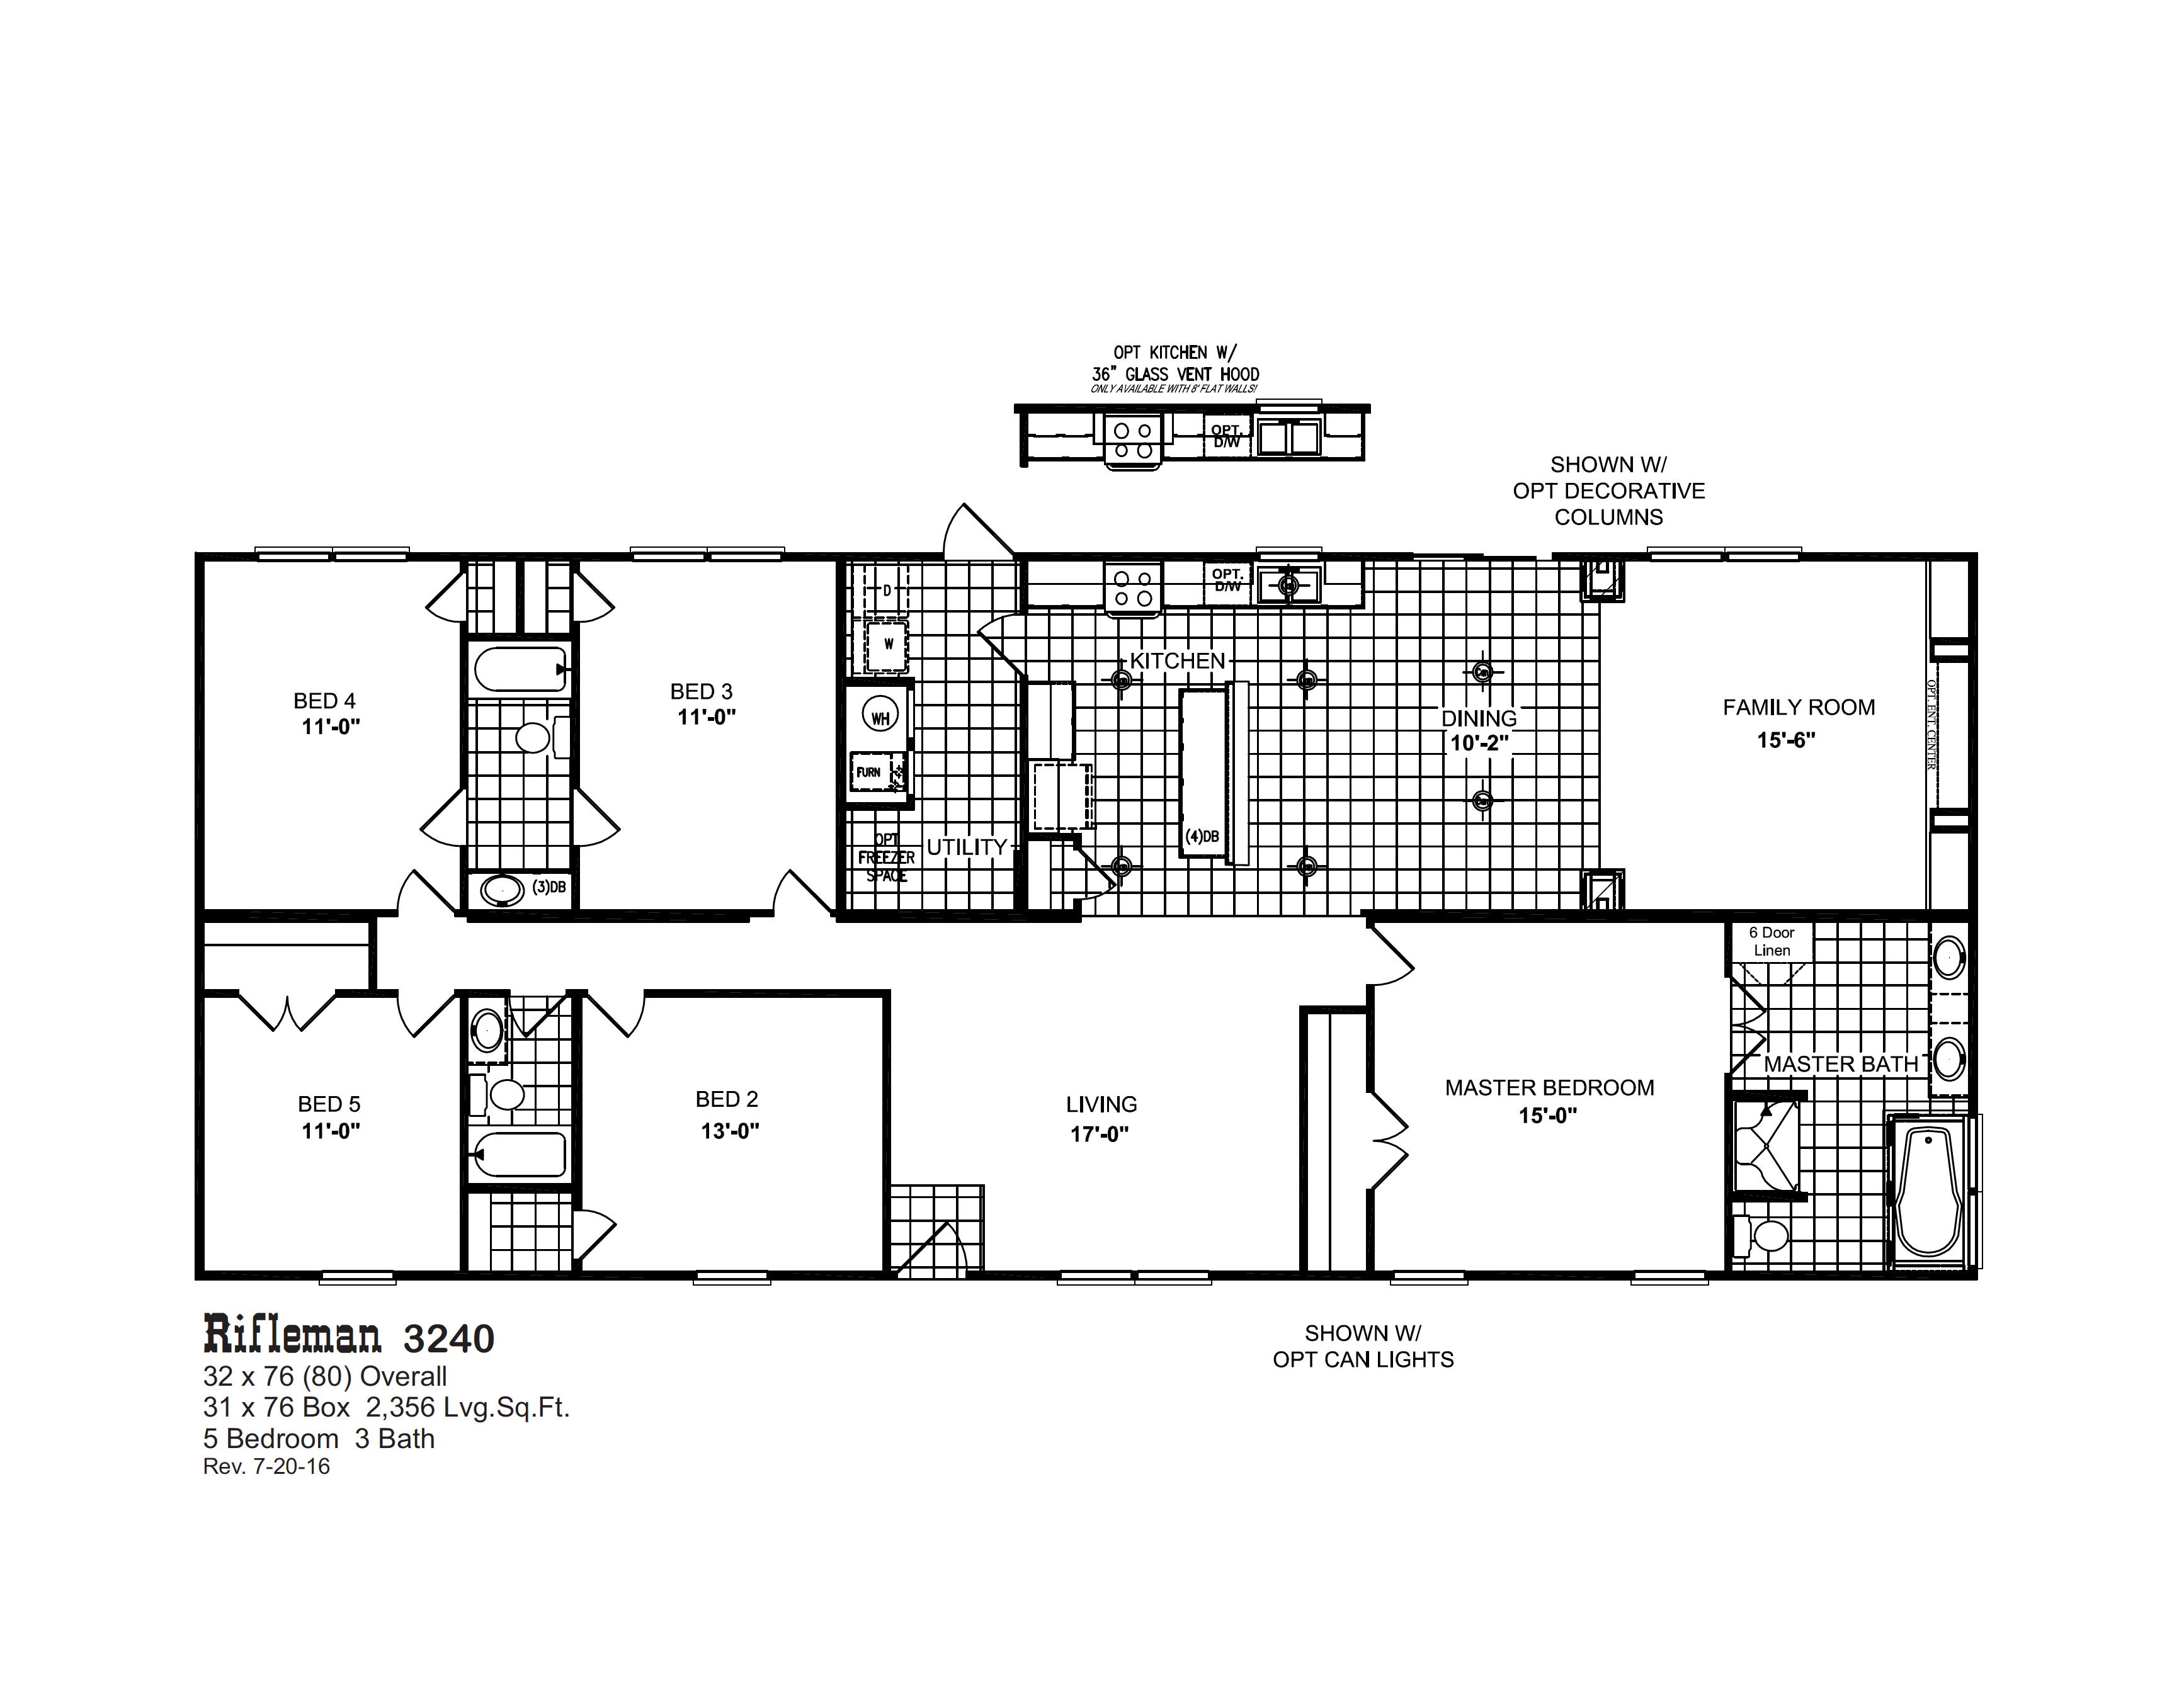 Rifleman 3240 Oak Creek Homes Mobile Home Floor Plans Modular Home Plans Manufactured Homes Floor Plans